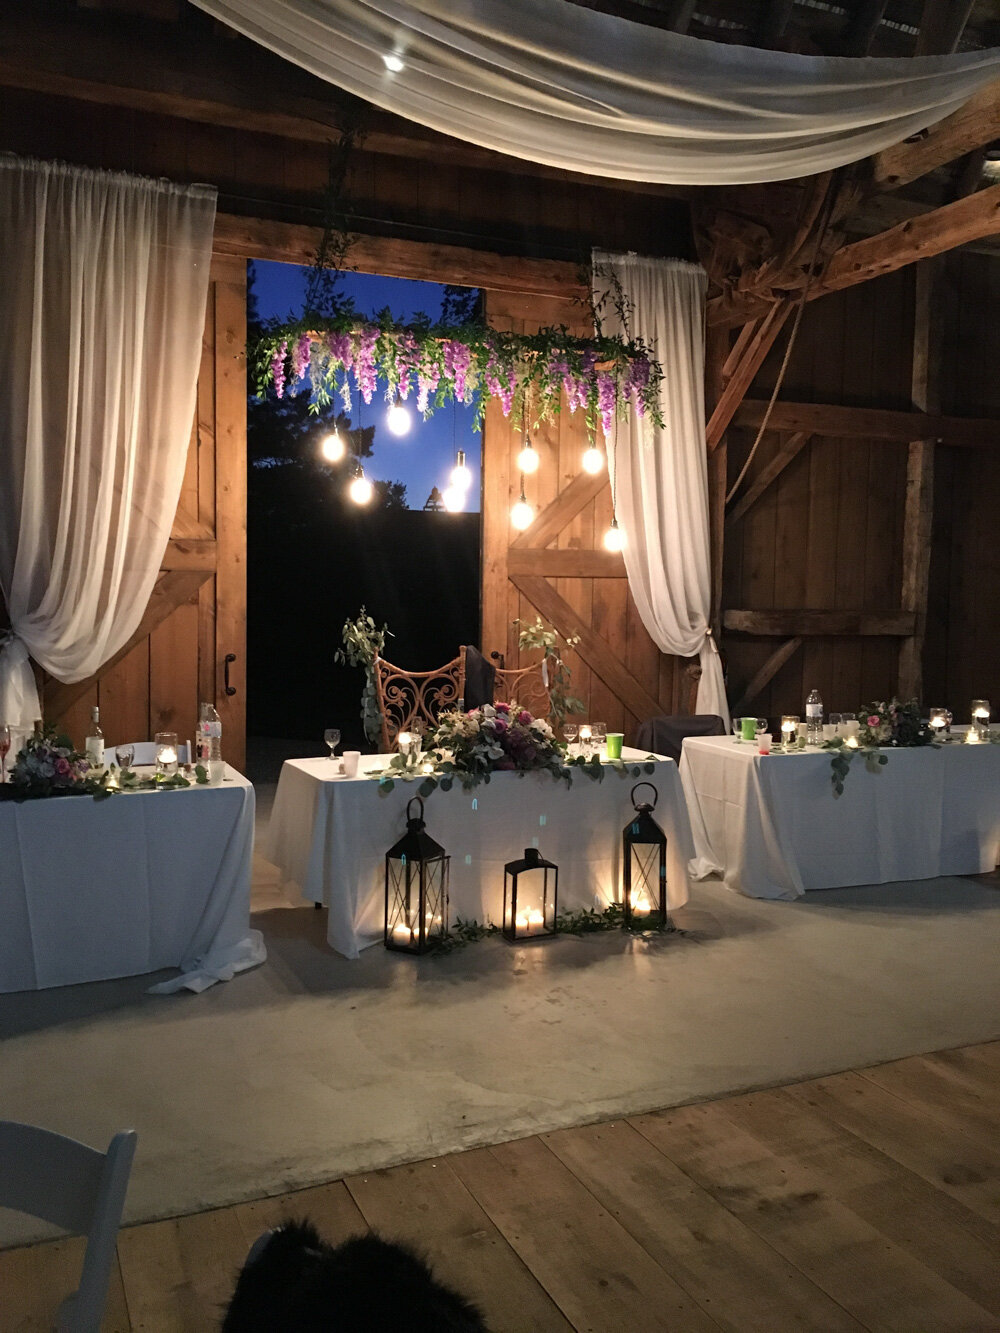 vineyard-bride-vendor-spotlight-the-swish-list-sparkle-and-twine-event-planning-design-wedding-vendors-niagara-toronto-southern-ontario-006.jpg